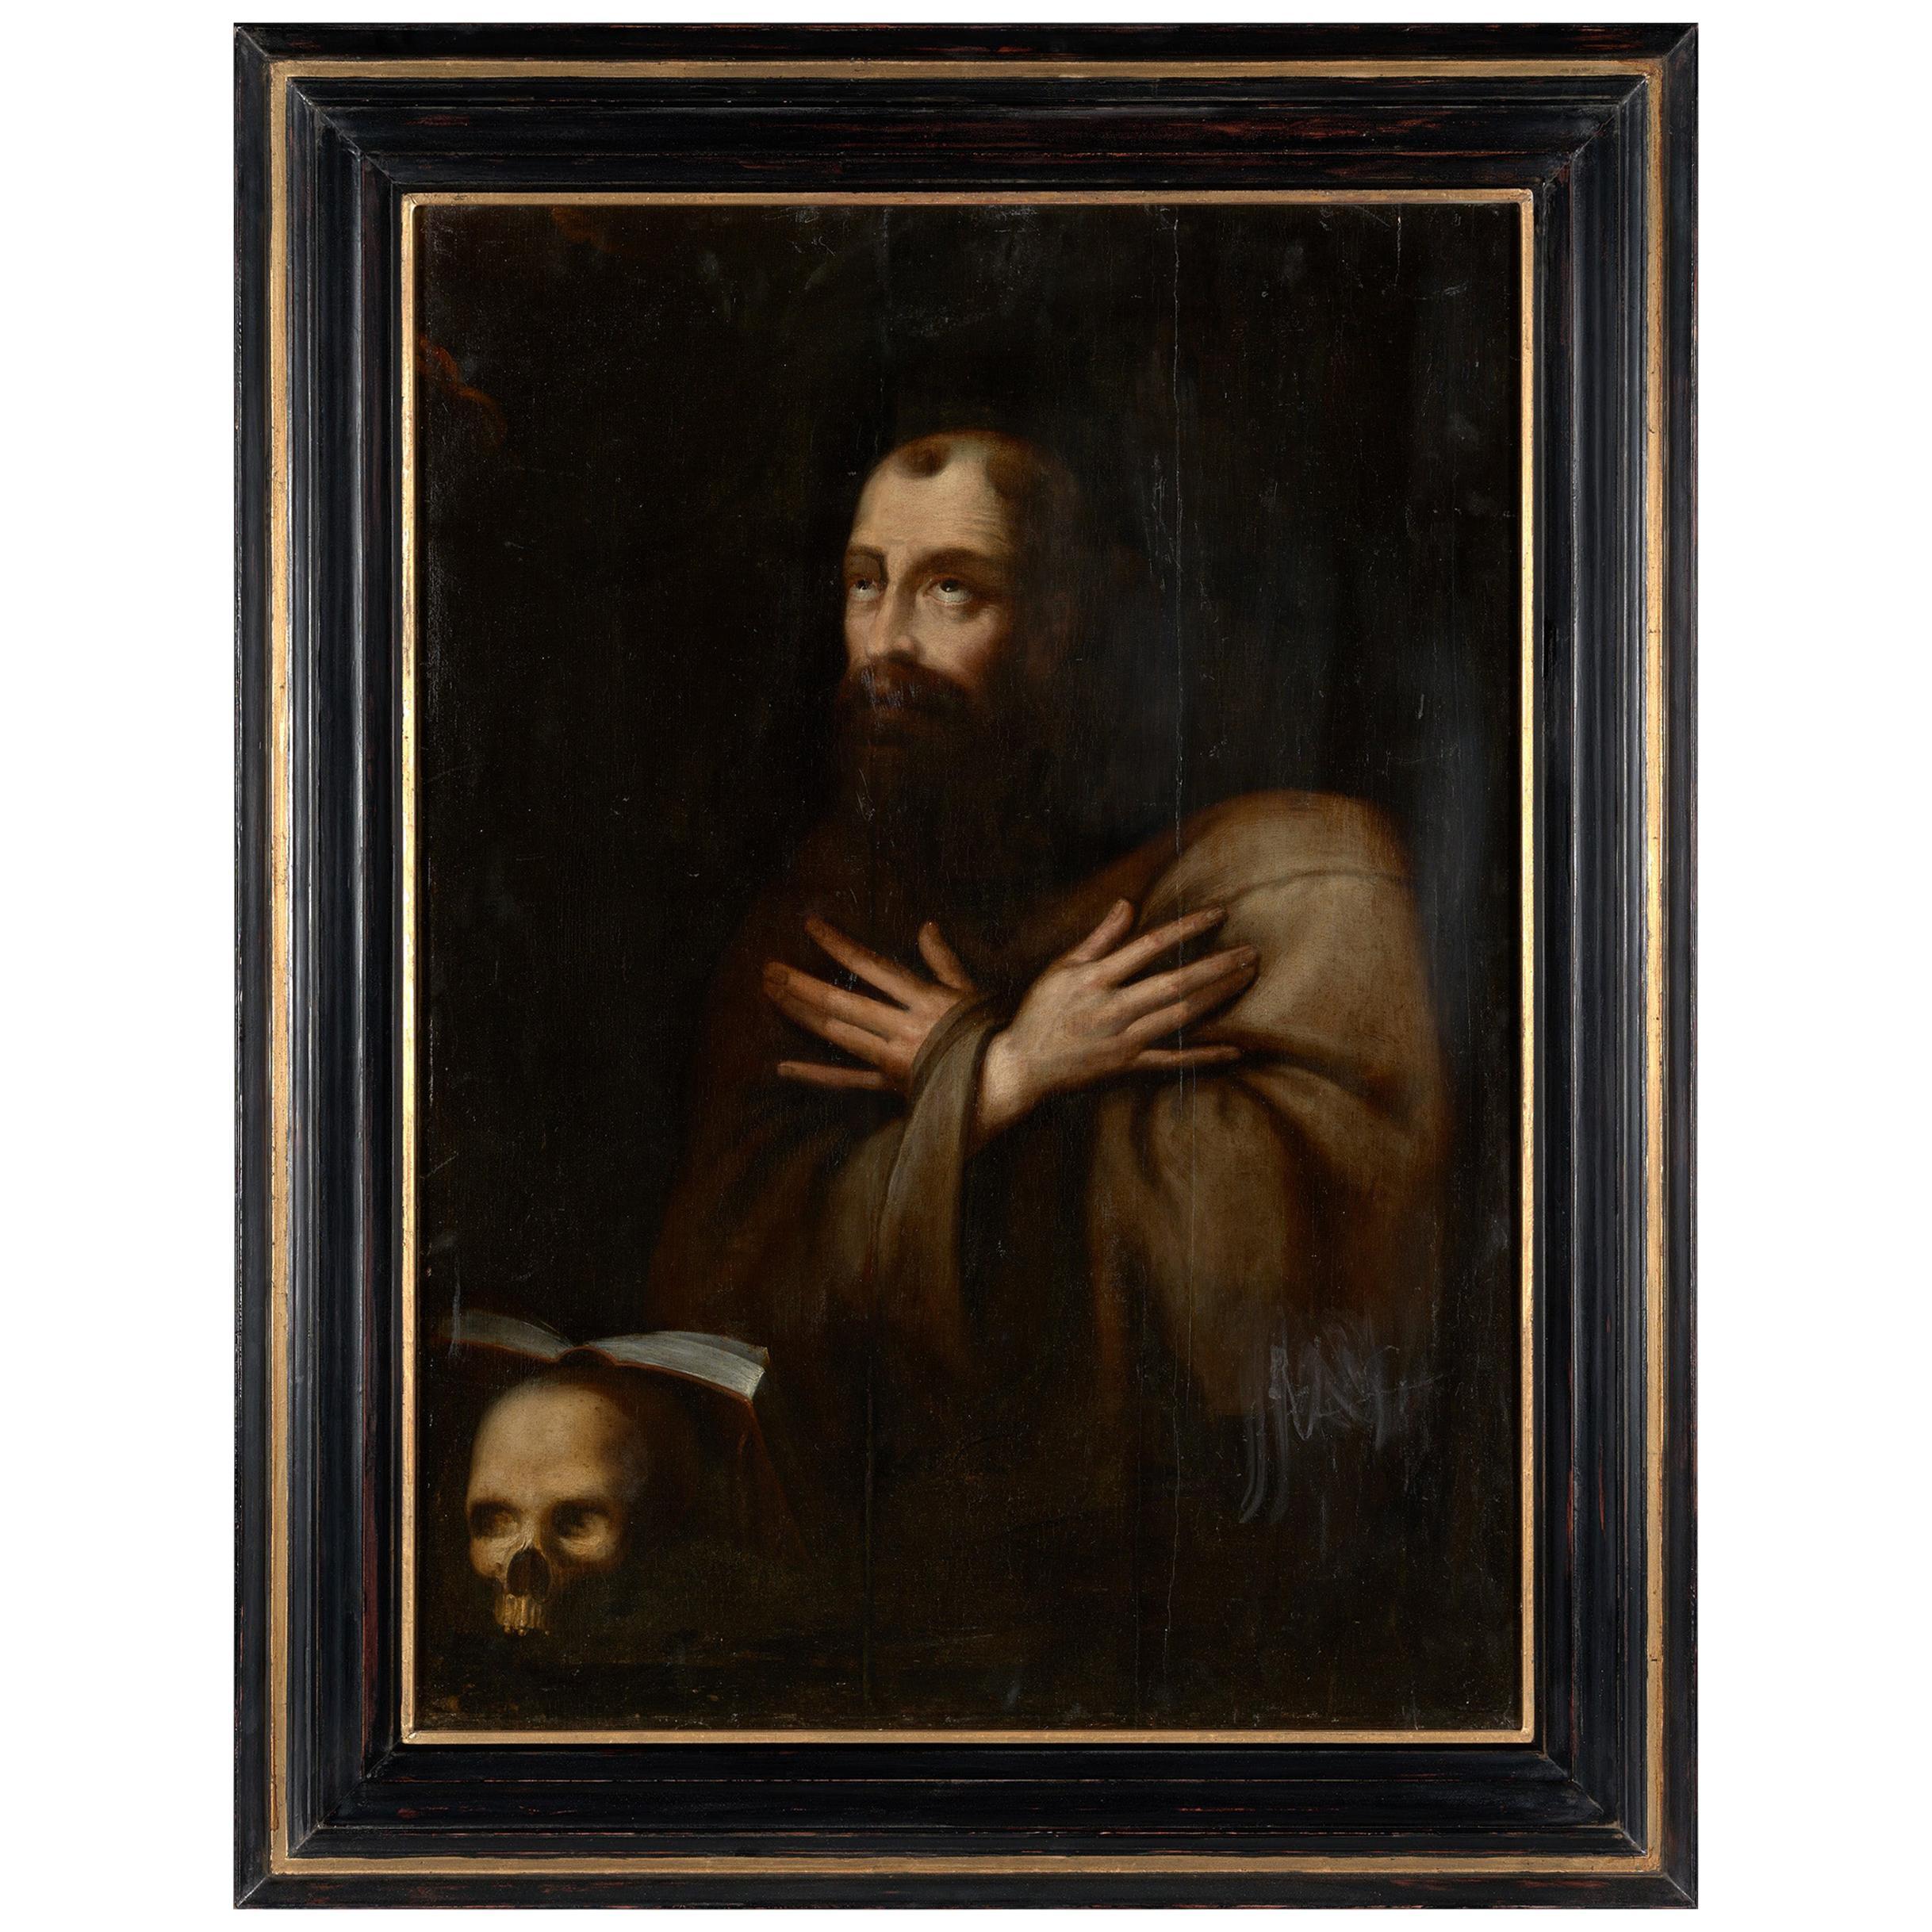 17th Century Flemish School, Saint Francis In Extasy, Oil on Oak Panel